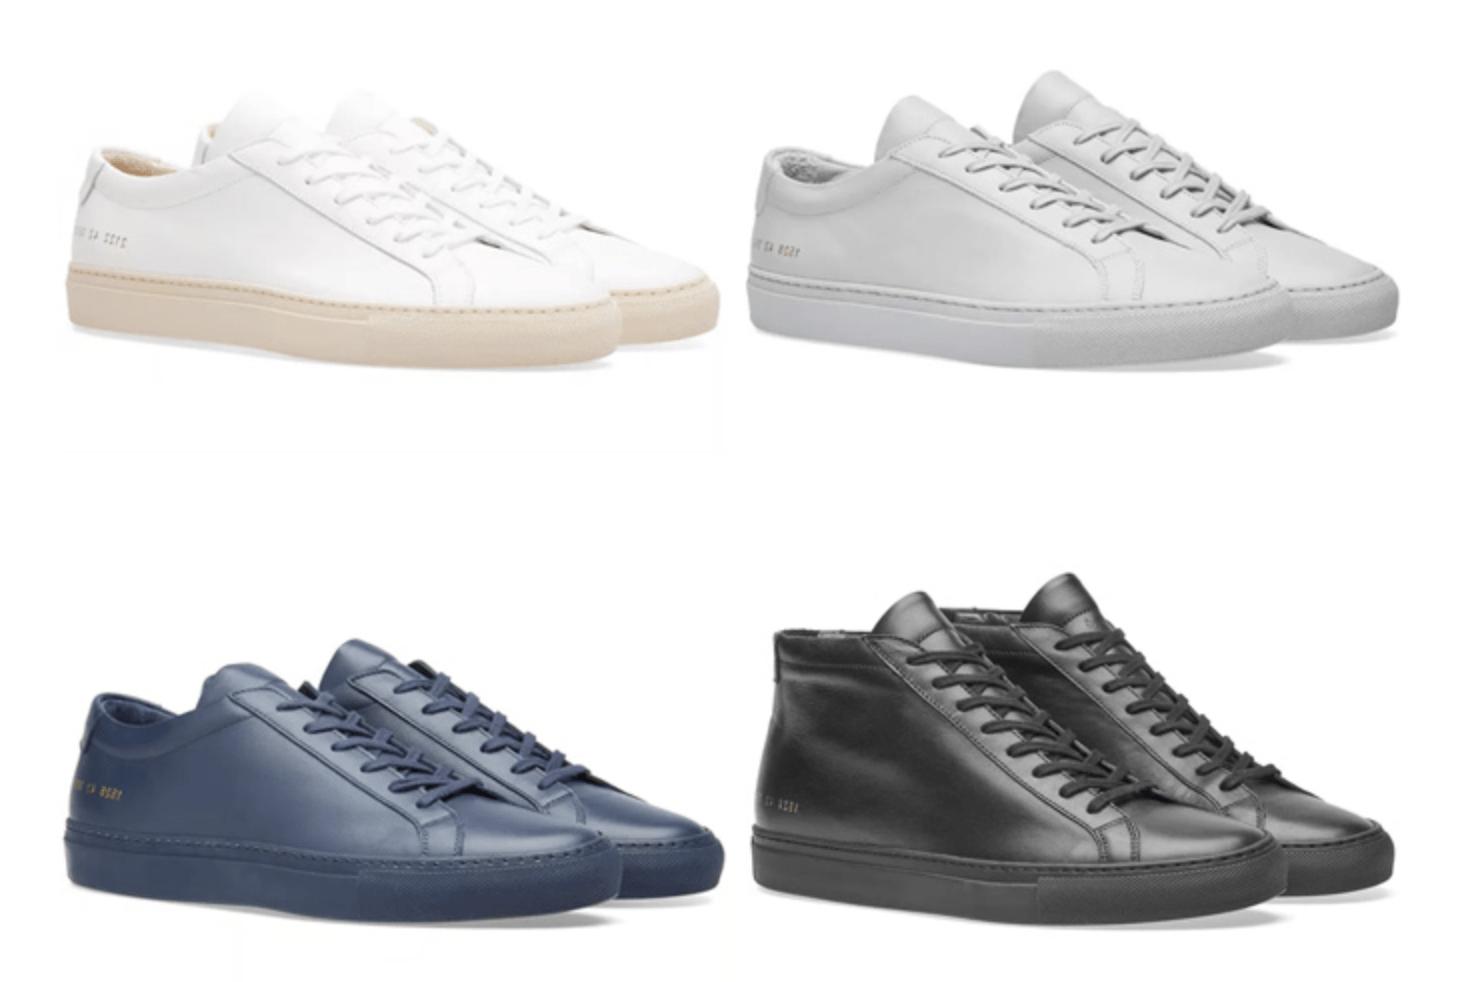 Sepatu Luxury Sneakers Common Project Terbaik